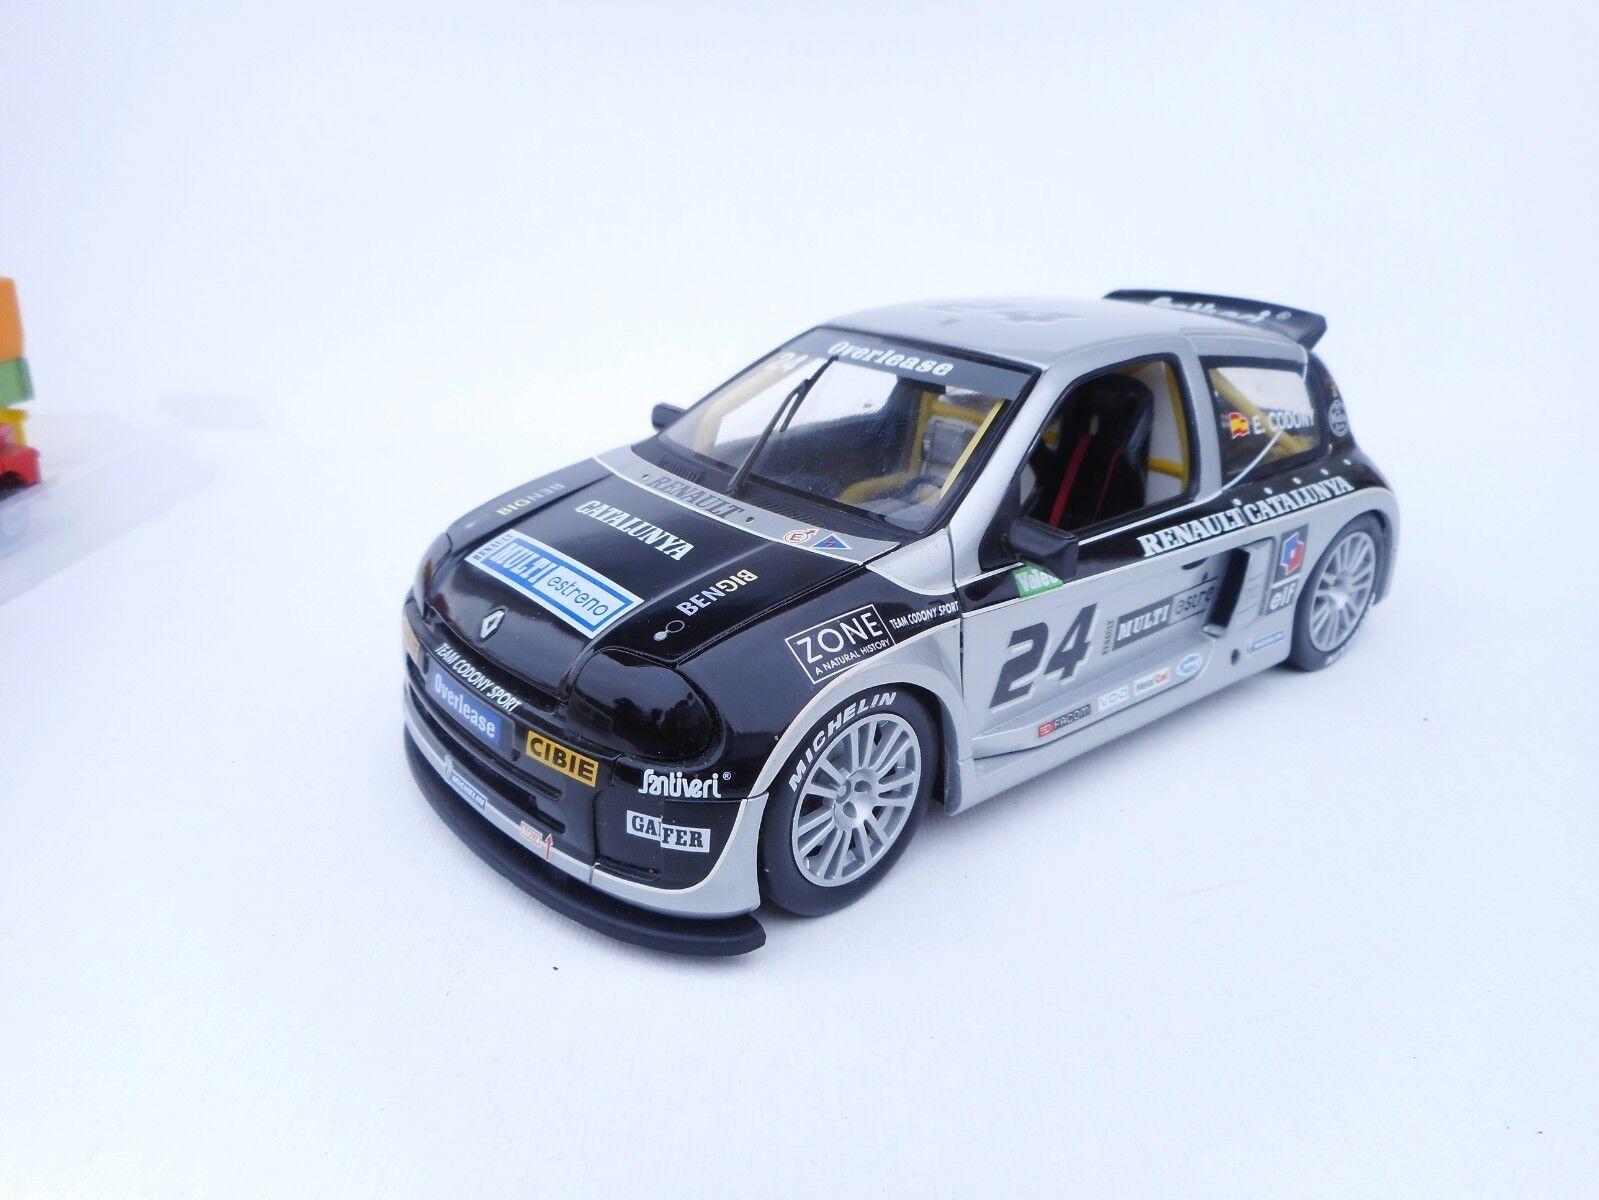 UNIVERSAL HOBBY 1 18 - Renault sport Clio Trophy    Renault Catalunya   24 NM 55a769